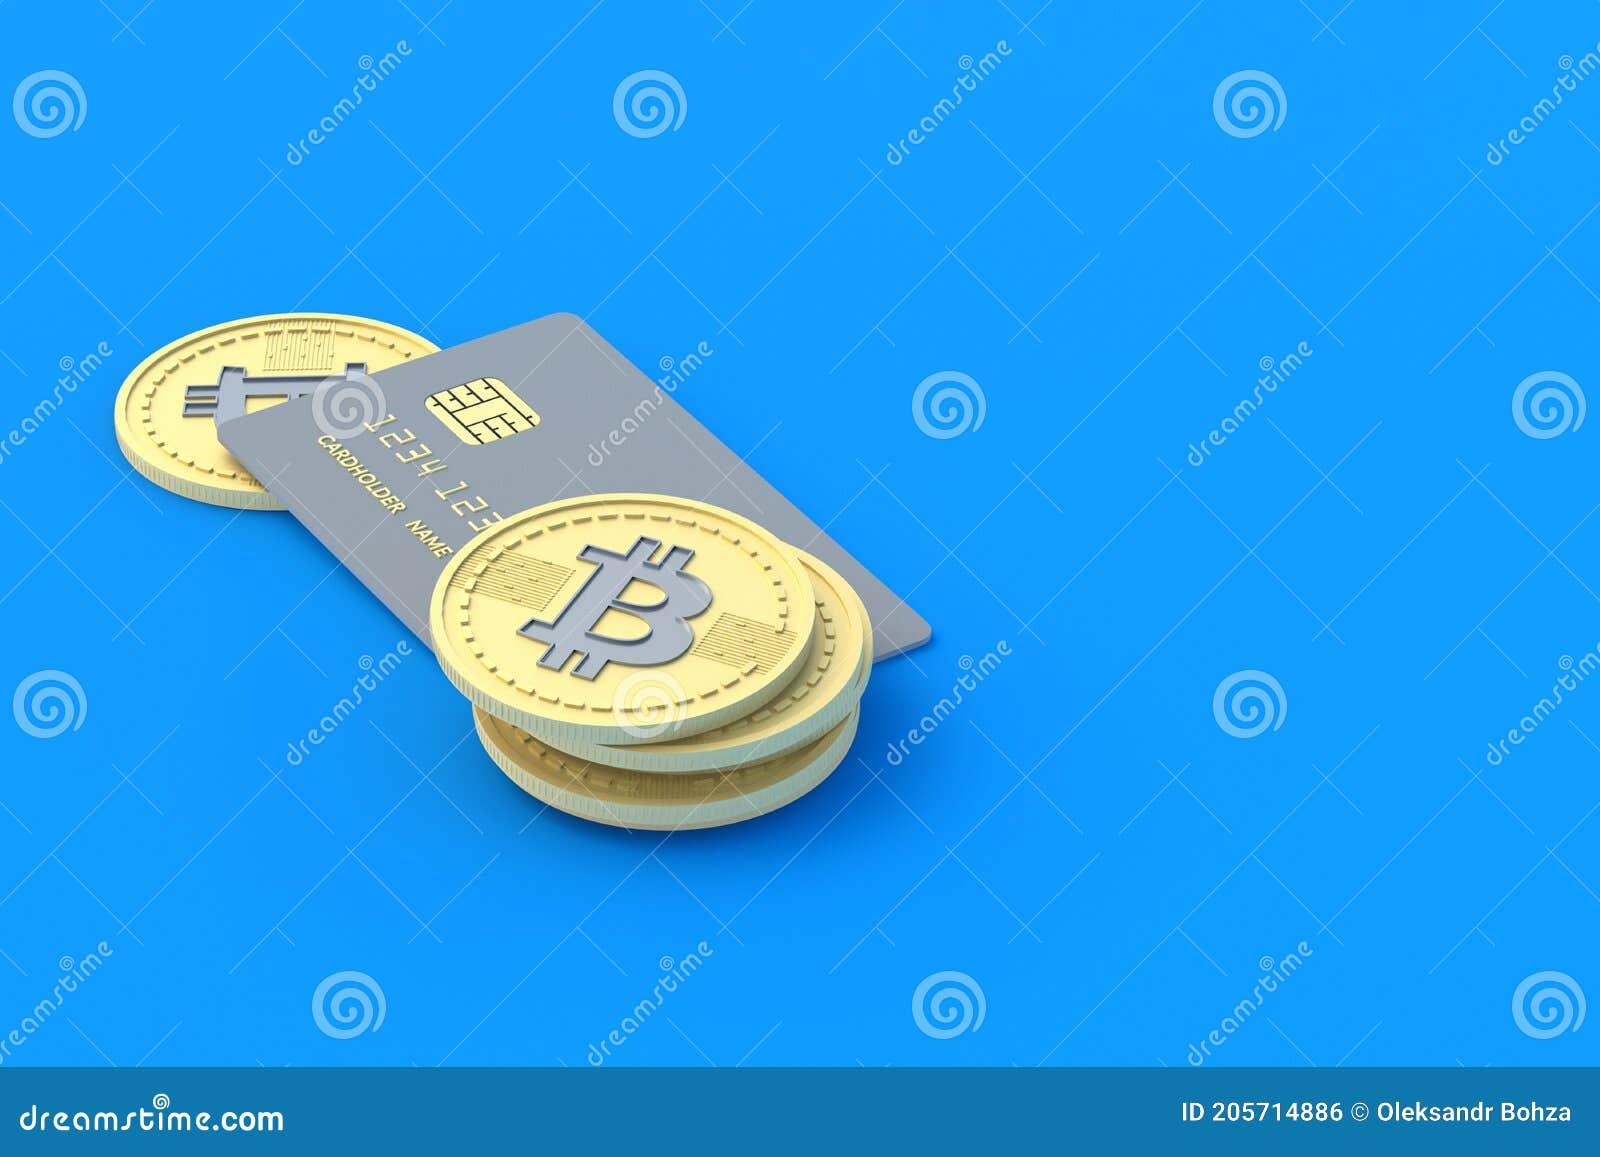 BTC to PEN Exchange Rates - BTC-PEN